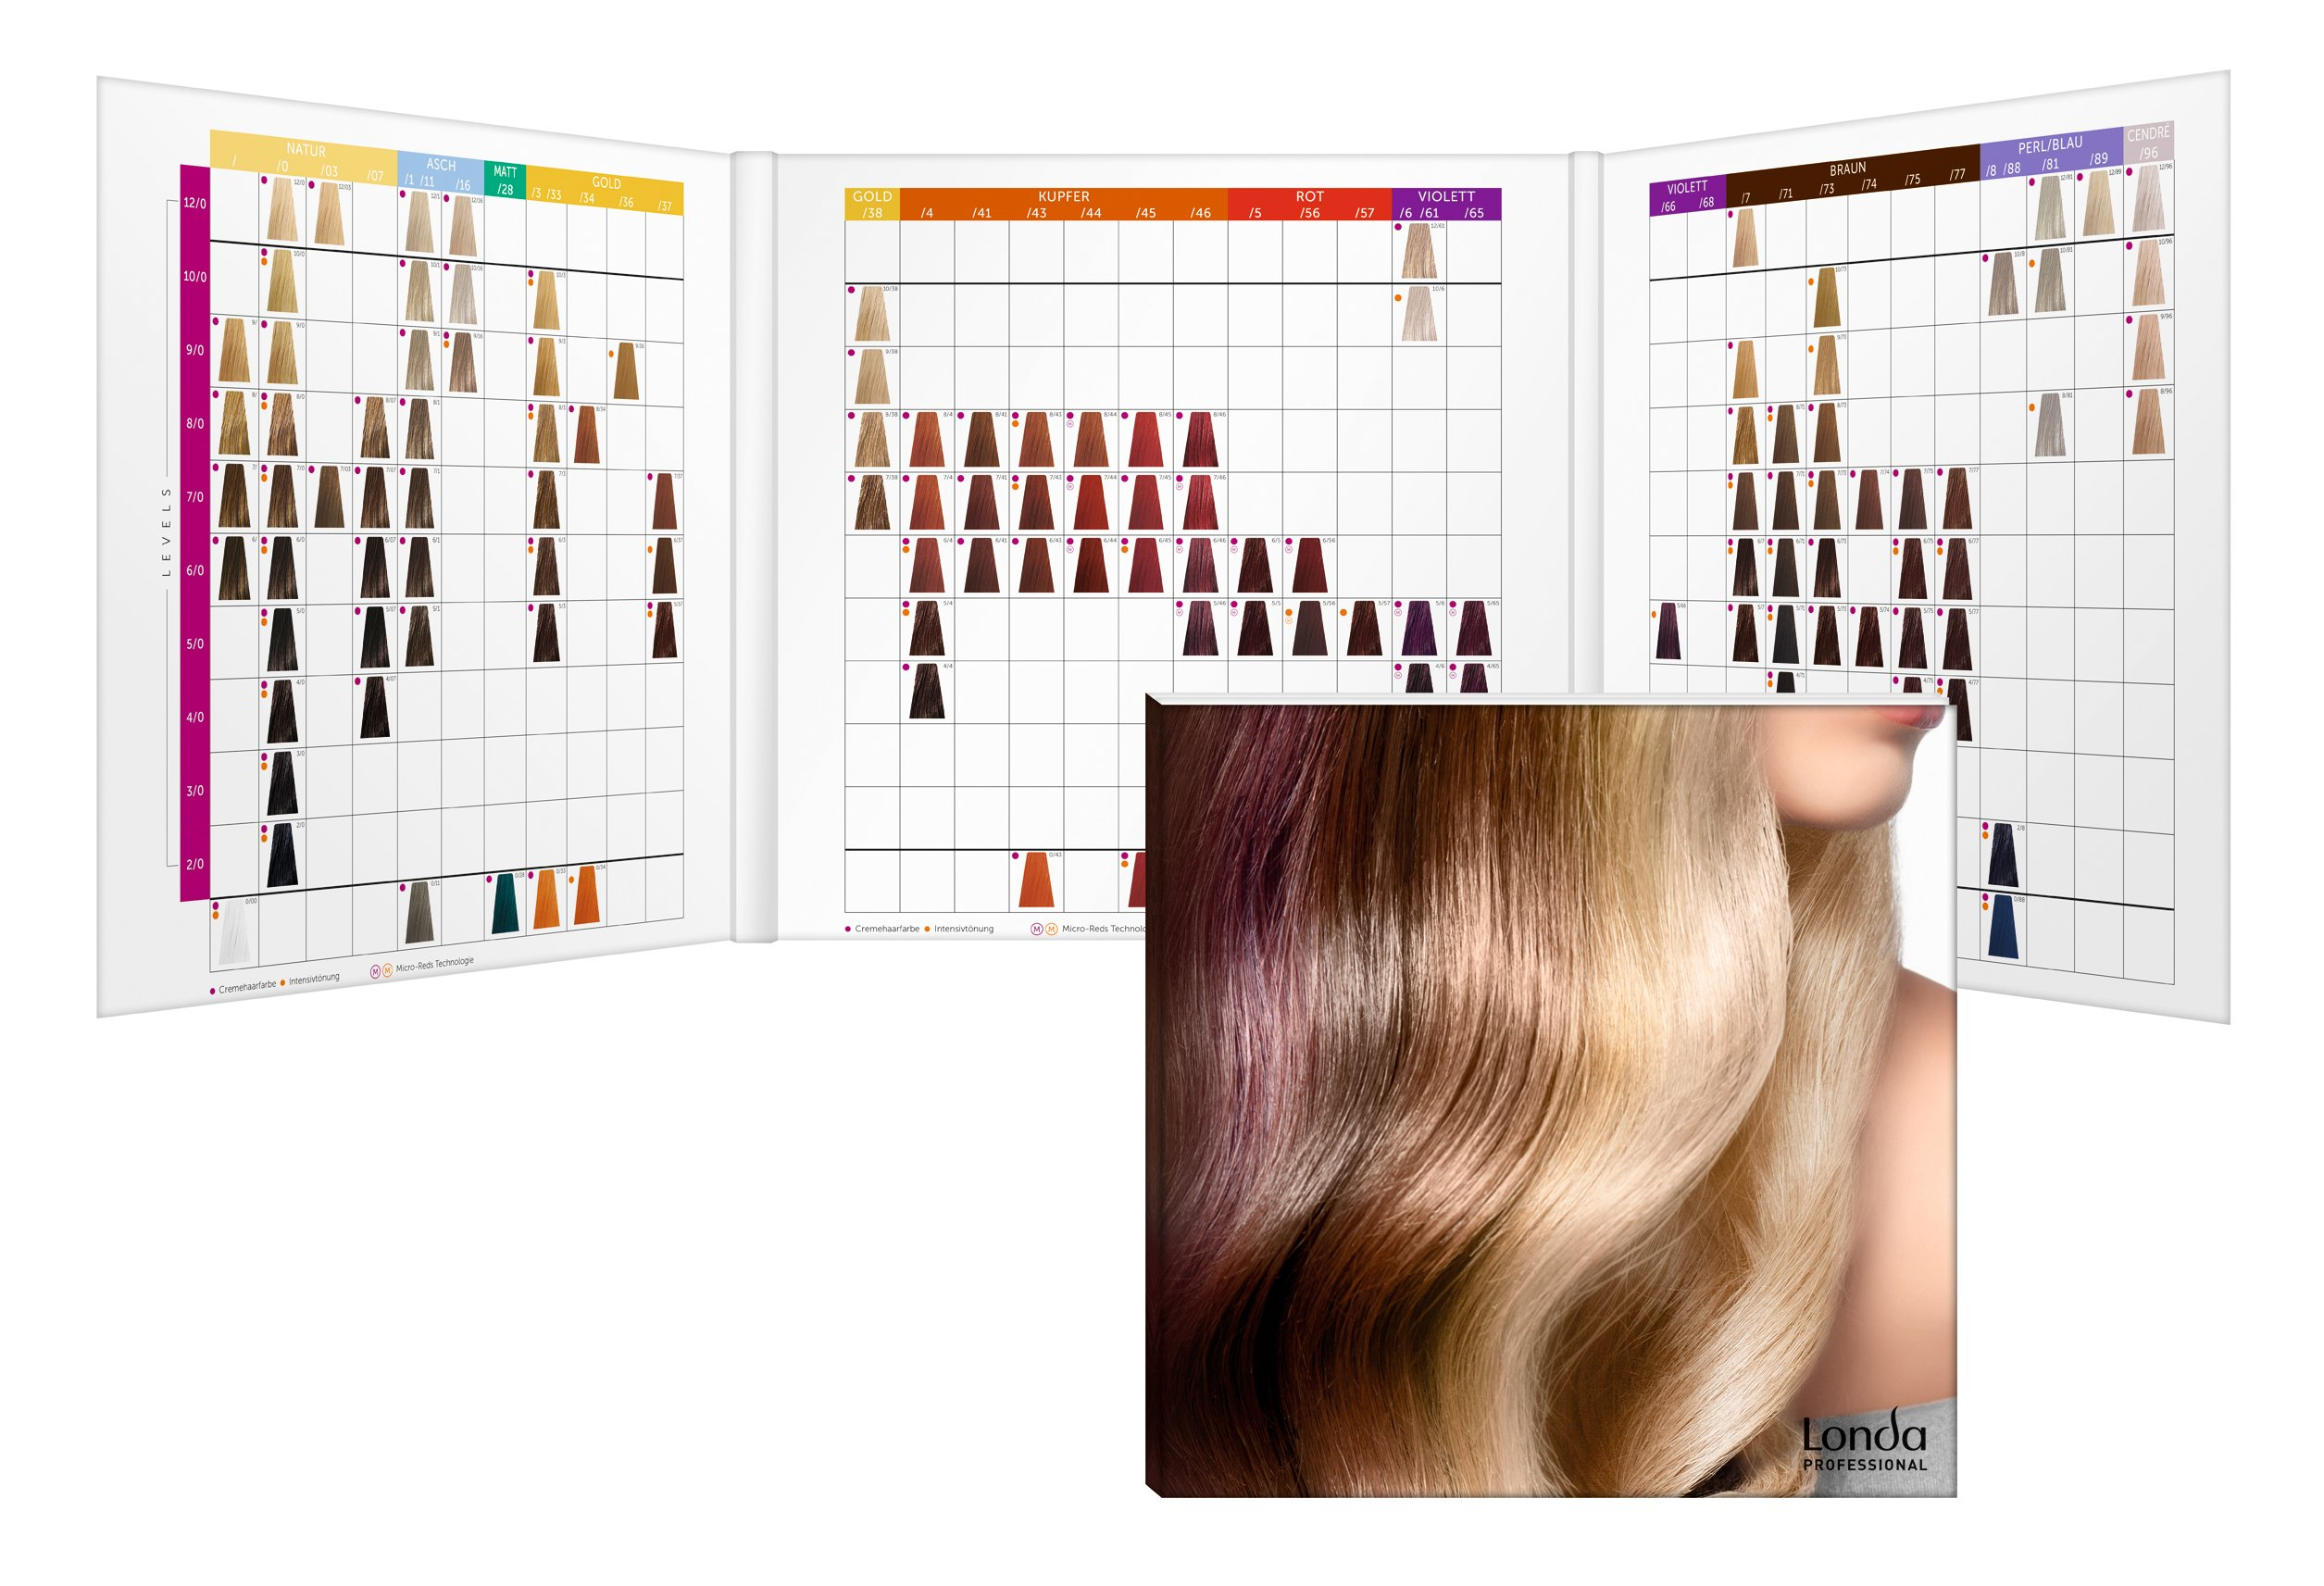 Eos haarfarben farbpalette